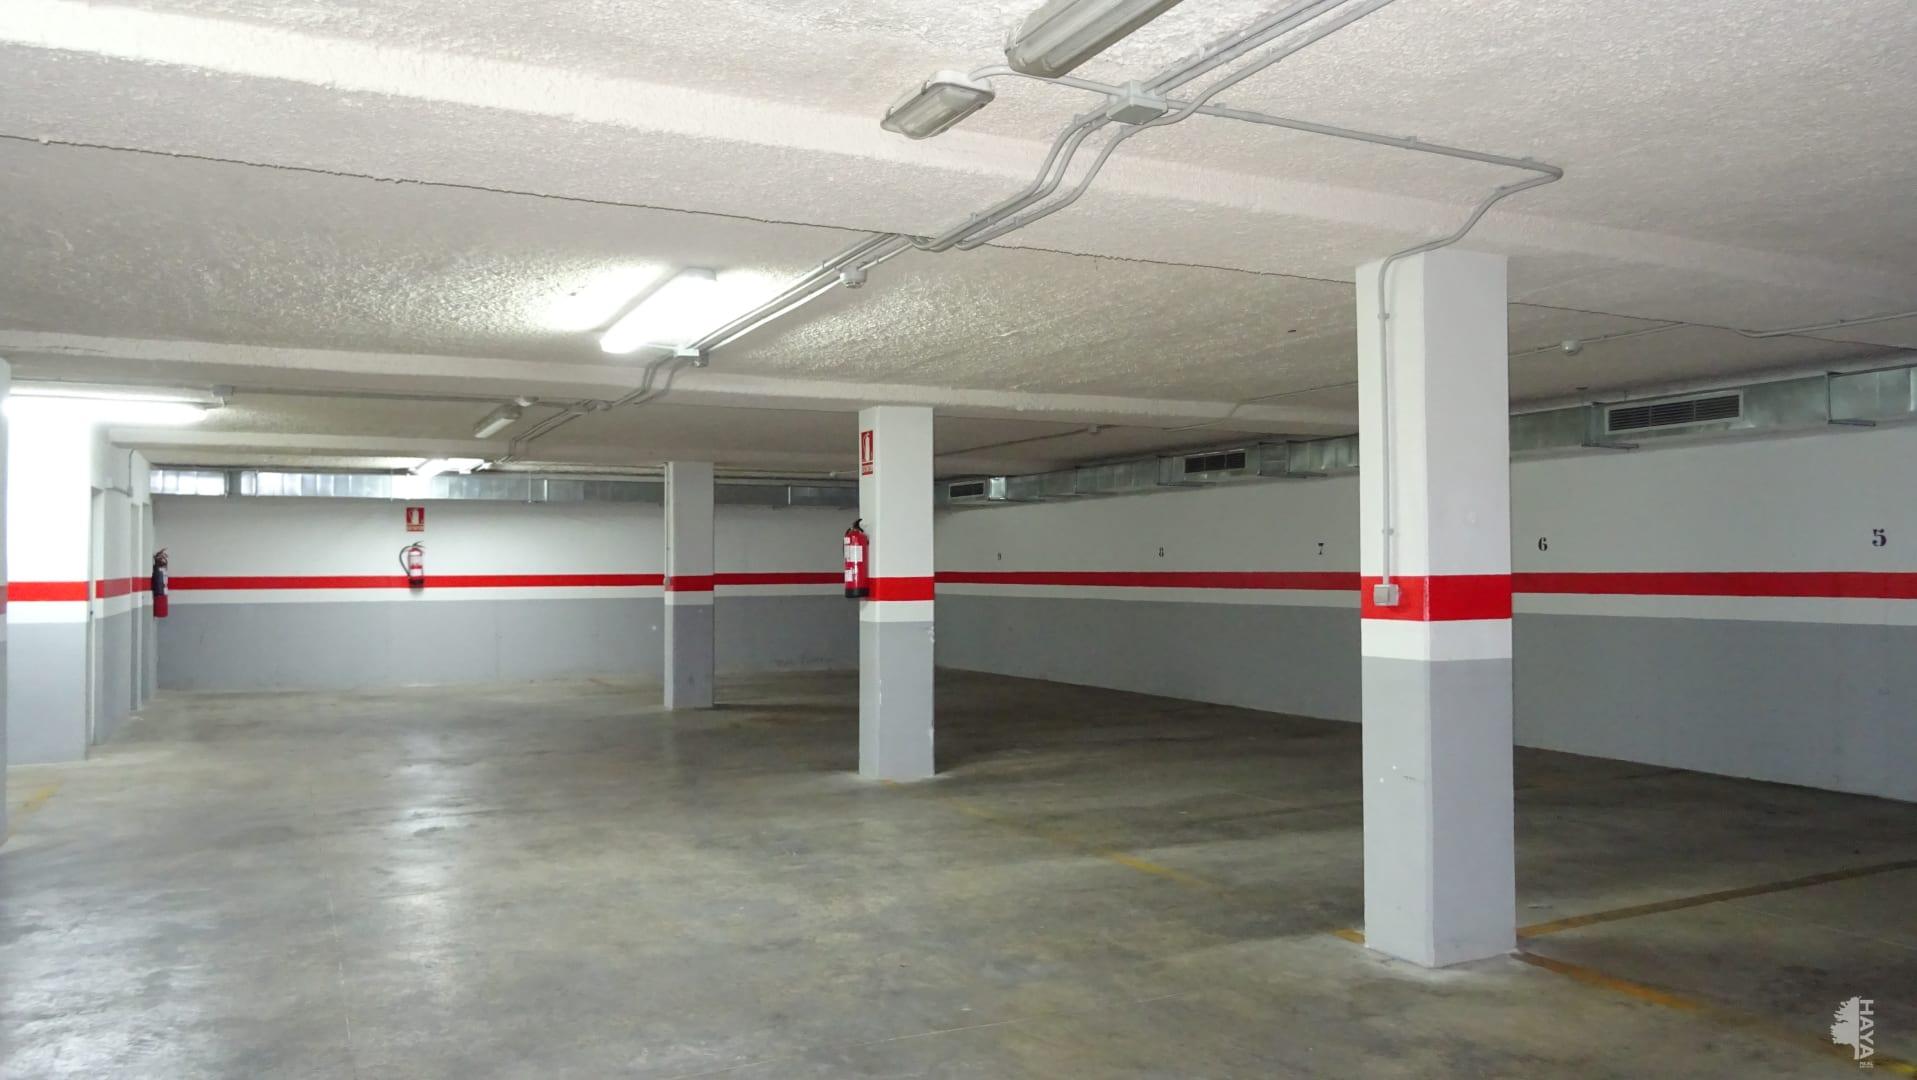 Autoparkplatz  Calle ausias march. Garaje en venta en calle ausias march, meliana, valencia